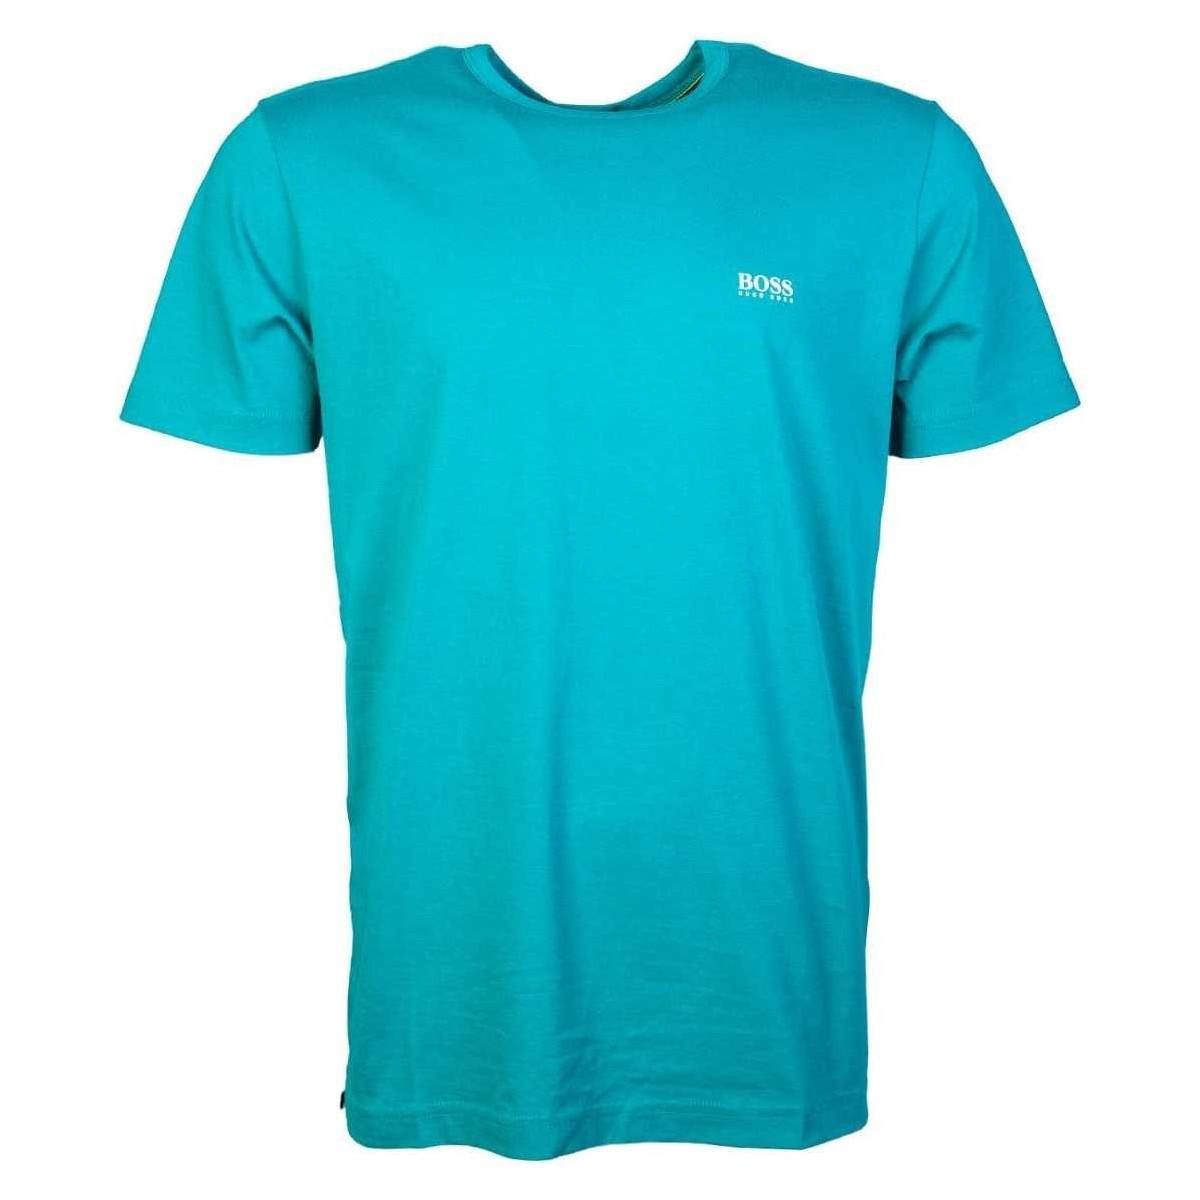 ca63d8a03 BOSS T Shirt Model Quot;tee 50333772 Quot; Men's T Shirt In Green in ...